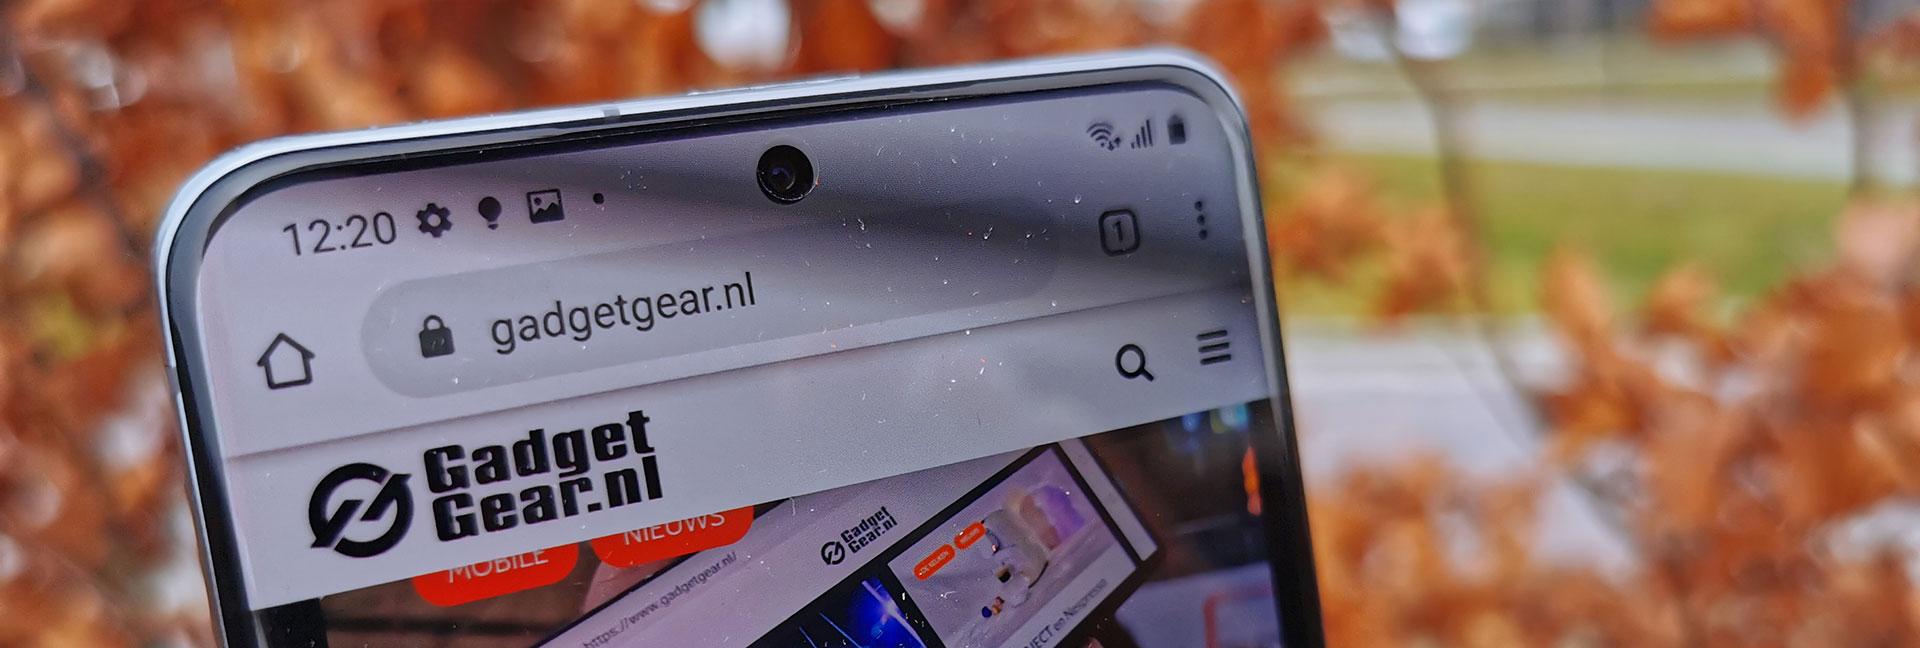 De selfie camera van de Samsung Galaxy S20 Ultra